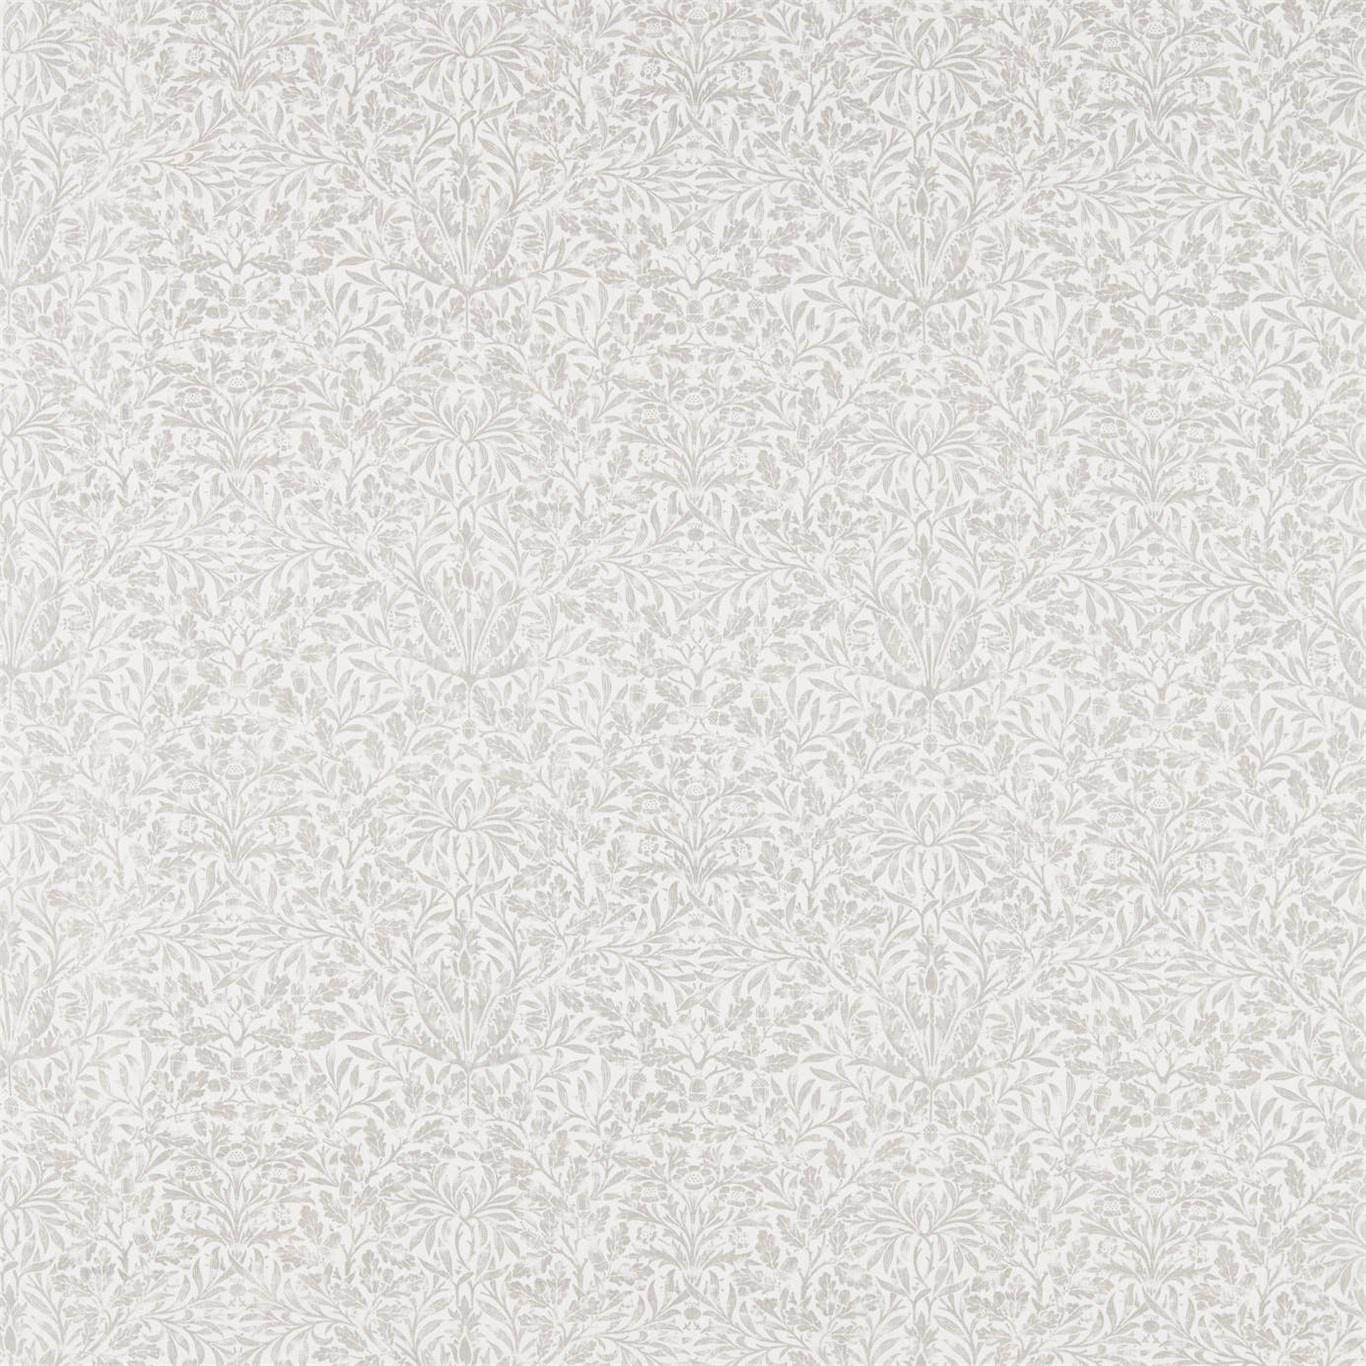 Image of Morris & Co Pure Acorn Dove Fabric 236063